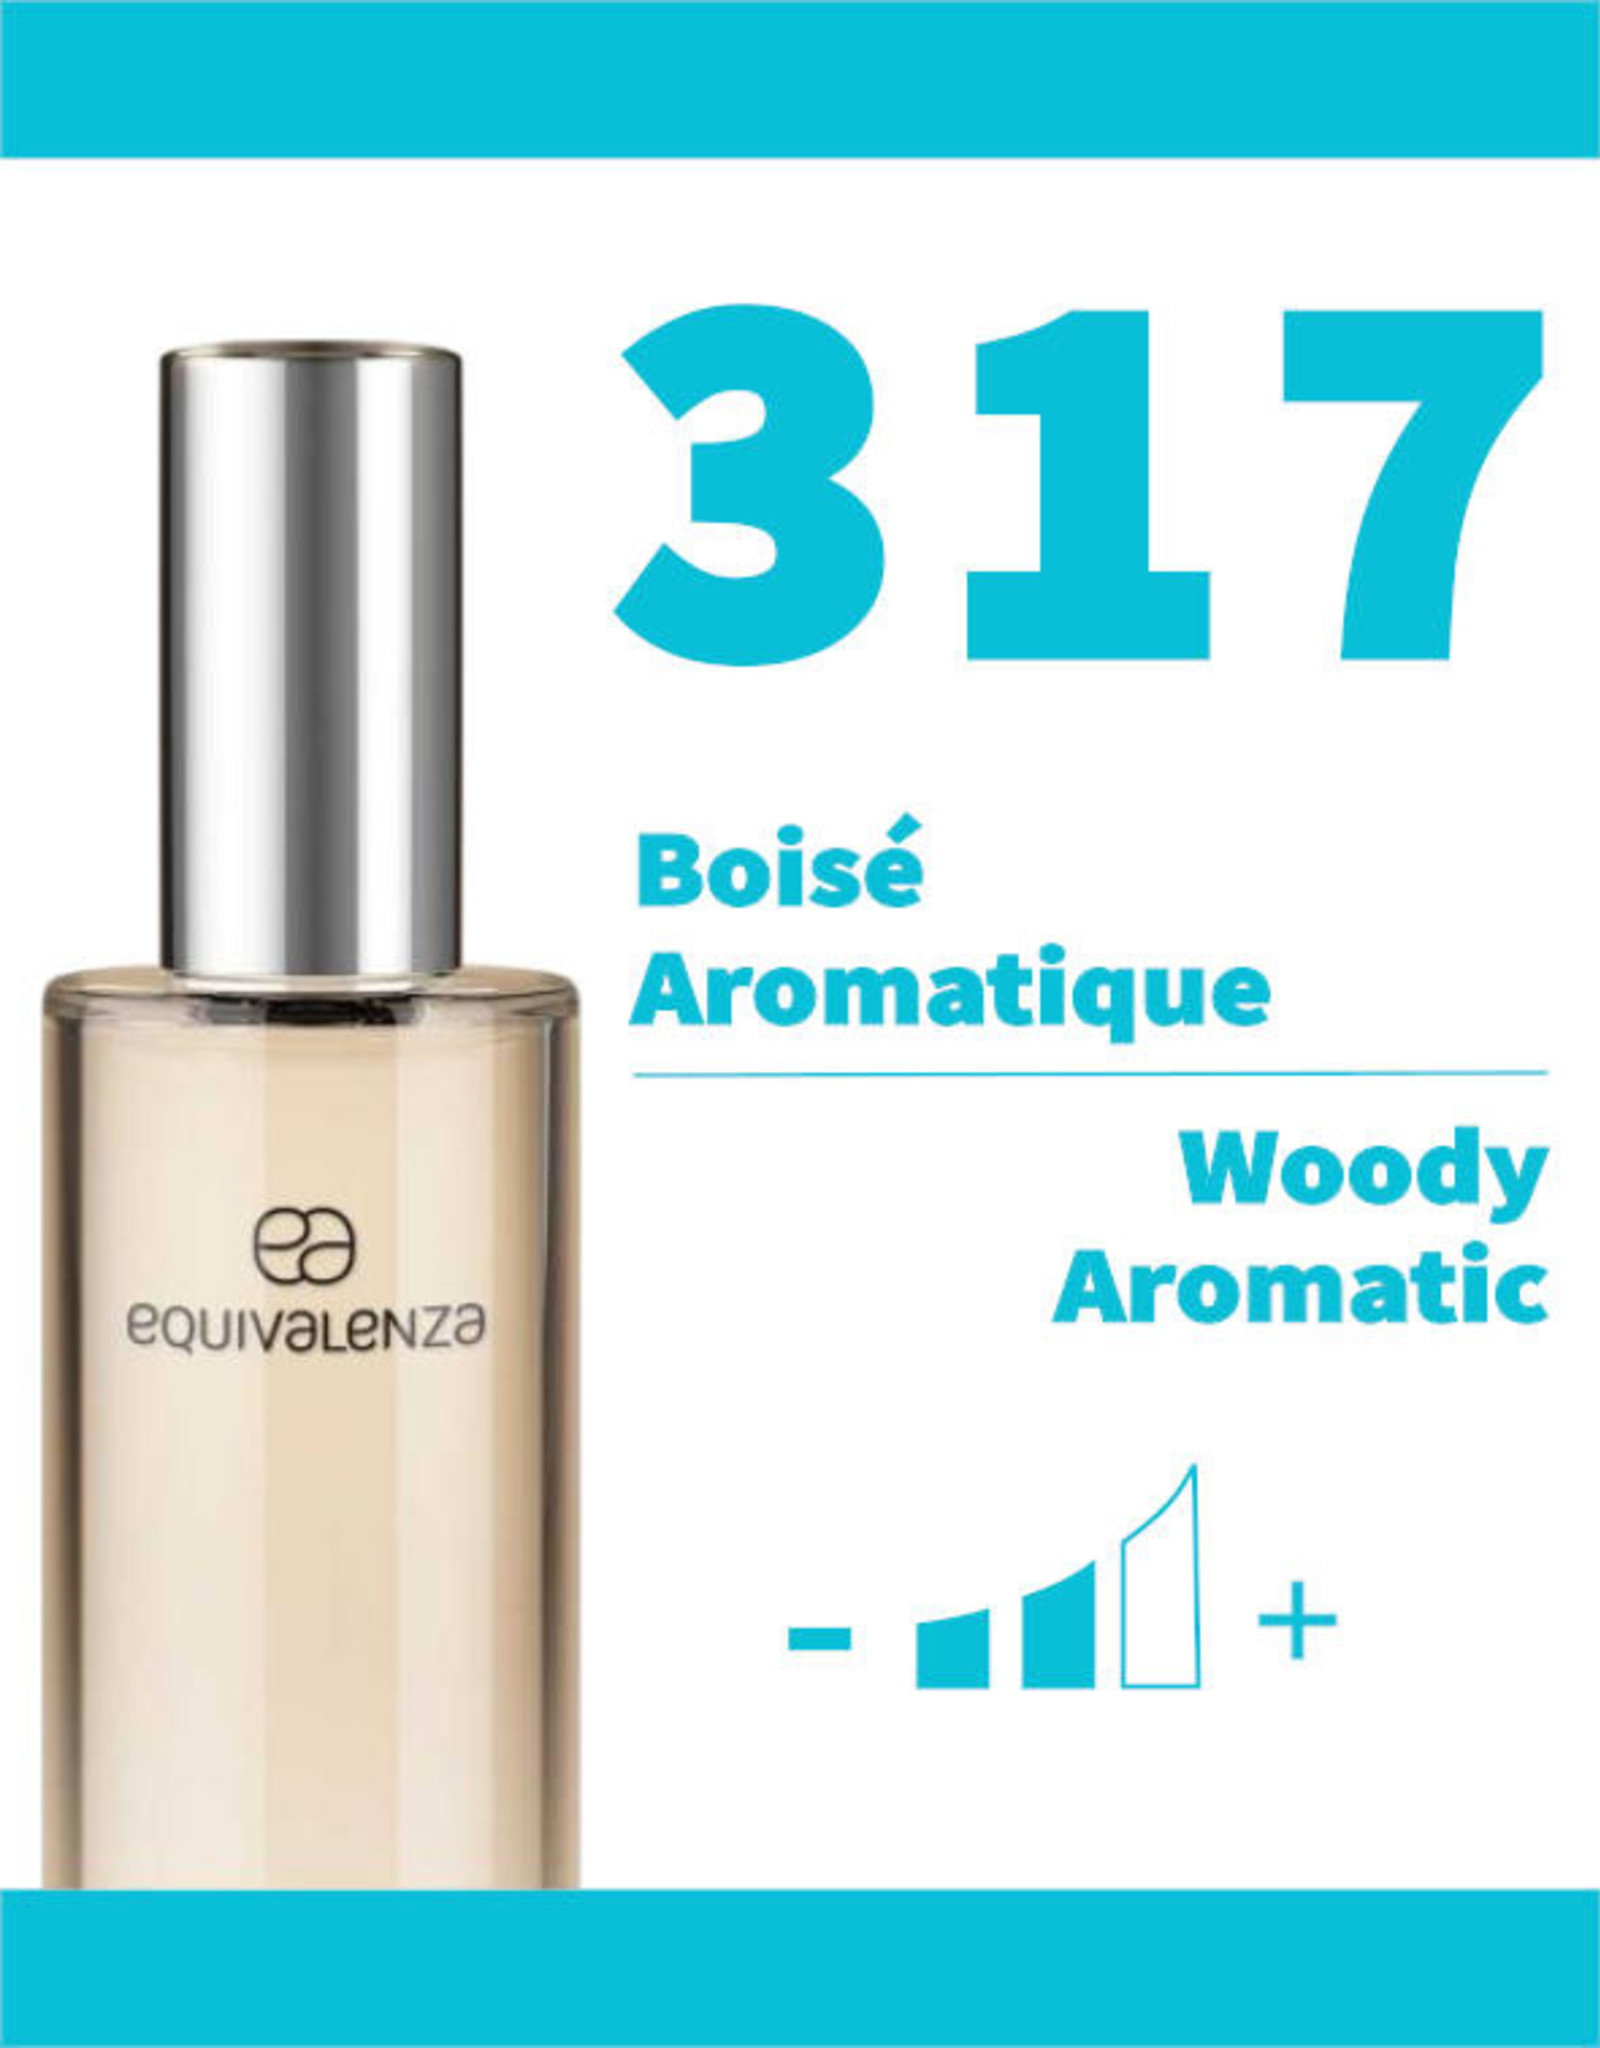 Equivalenza Eau de Parfum Woody Aromatic 317